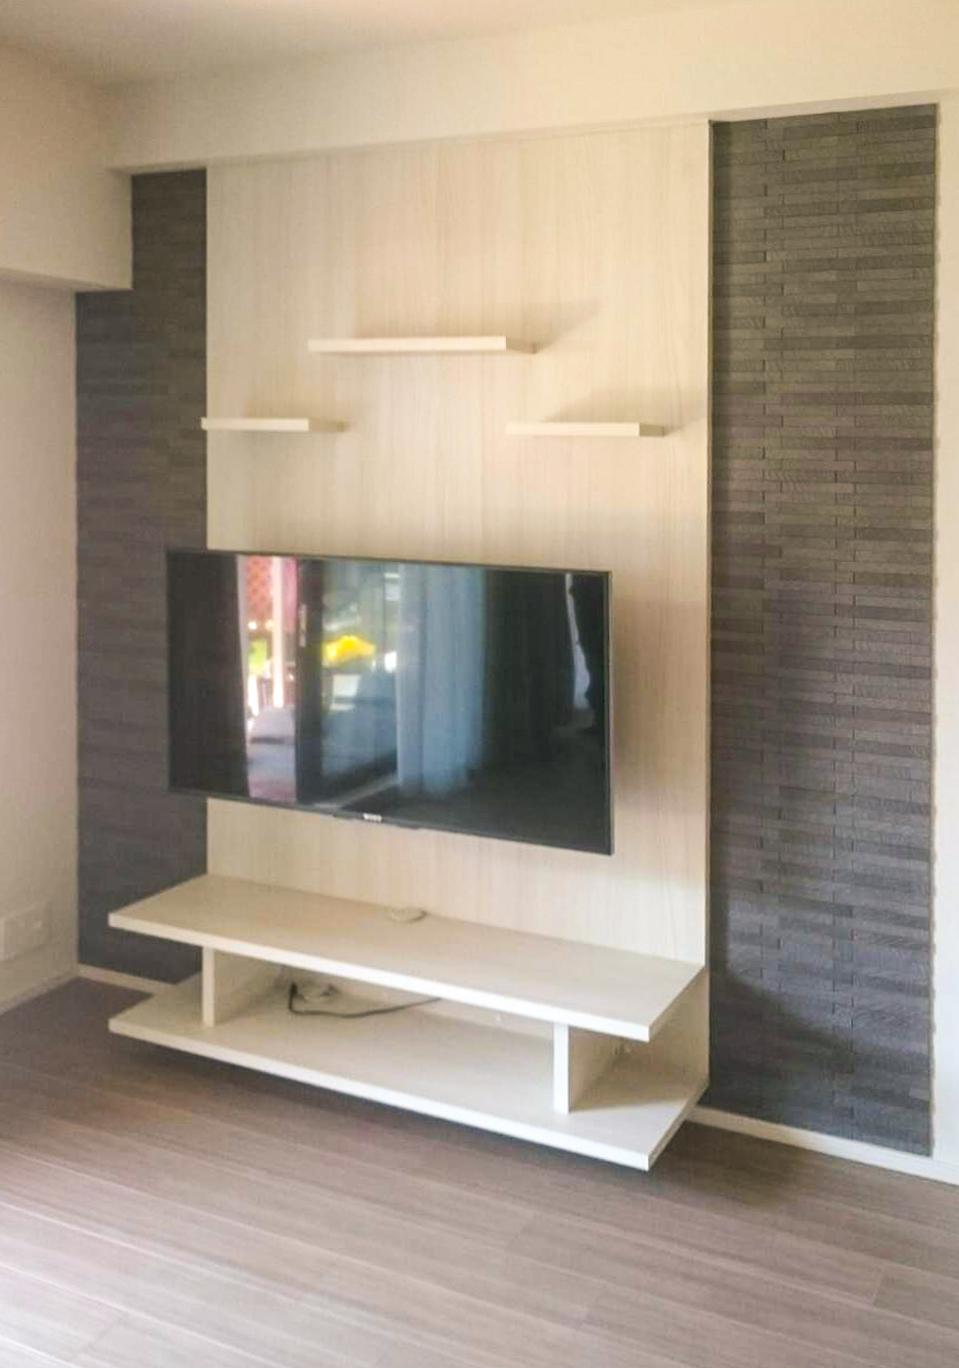 TV(パネル式)③-1